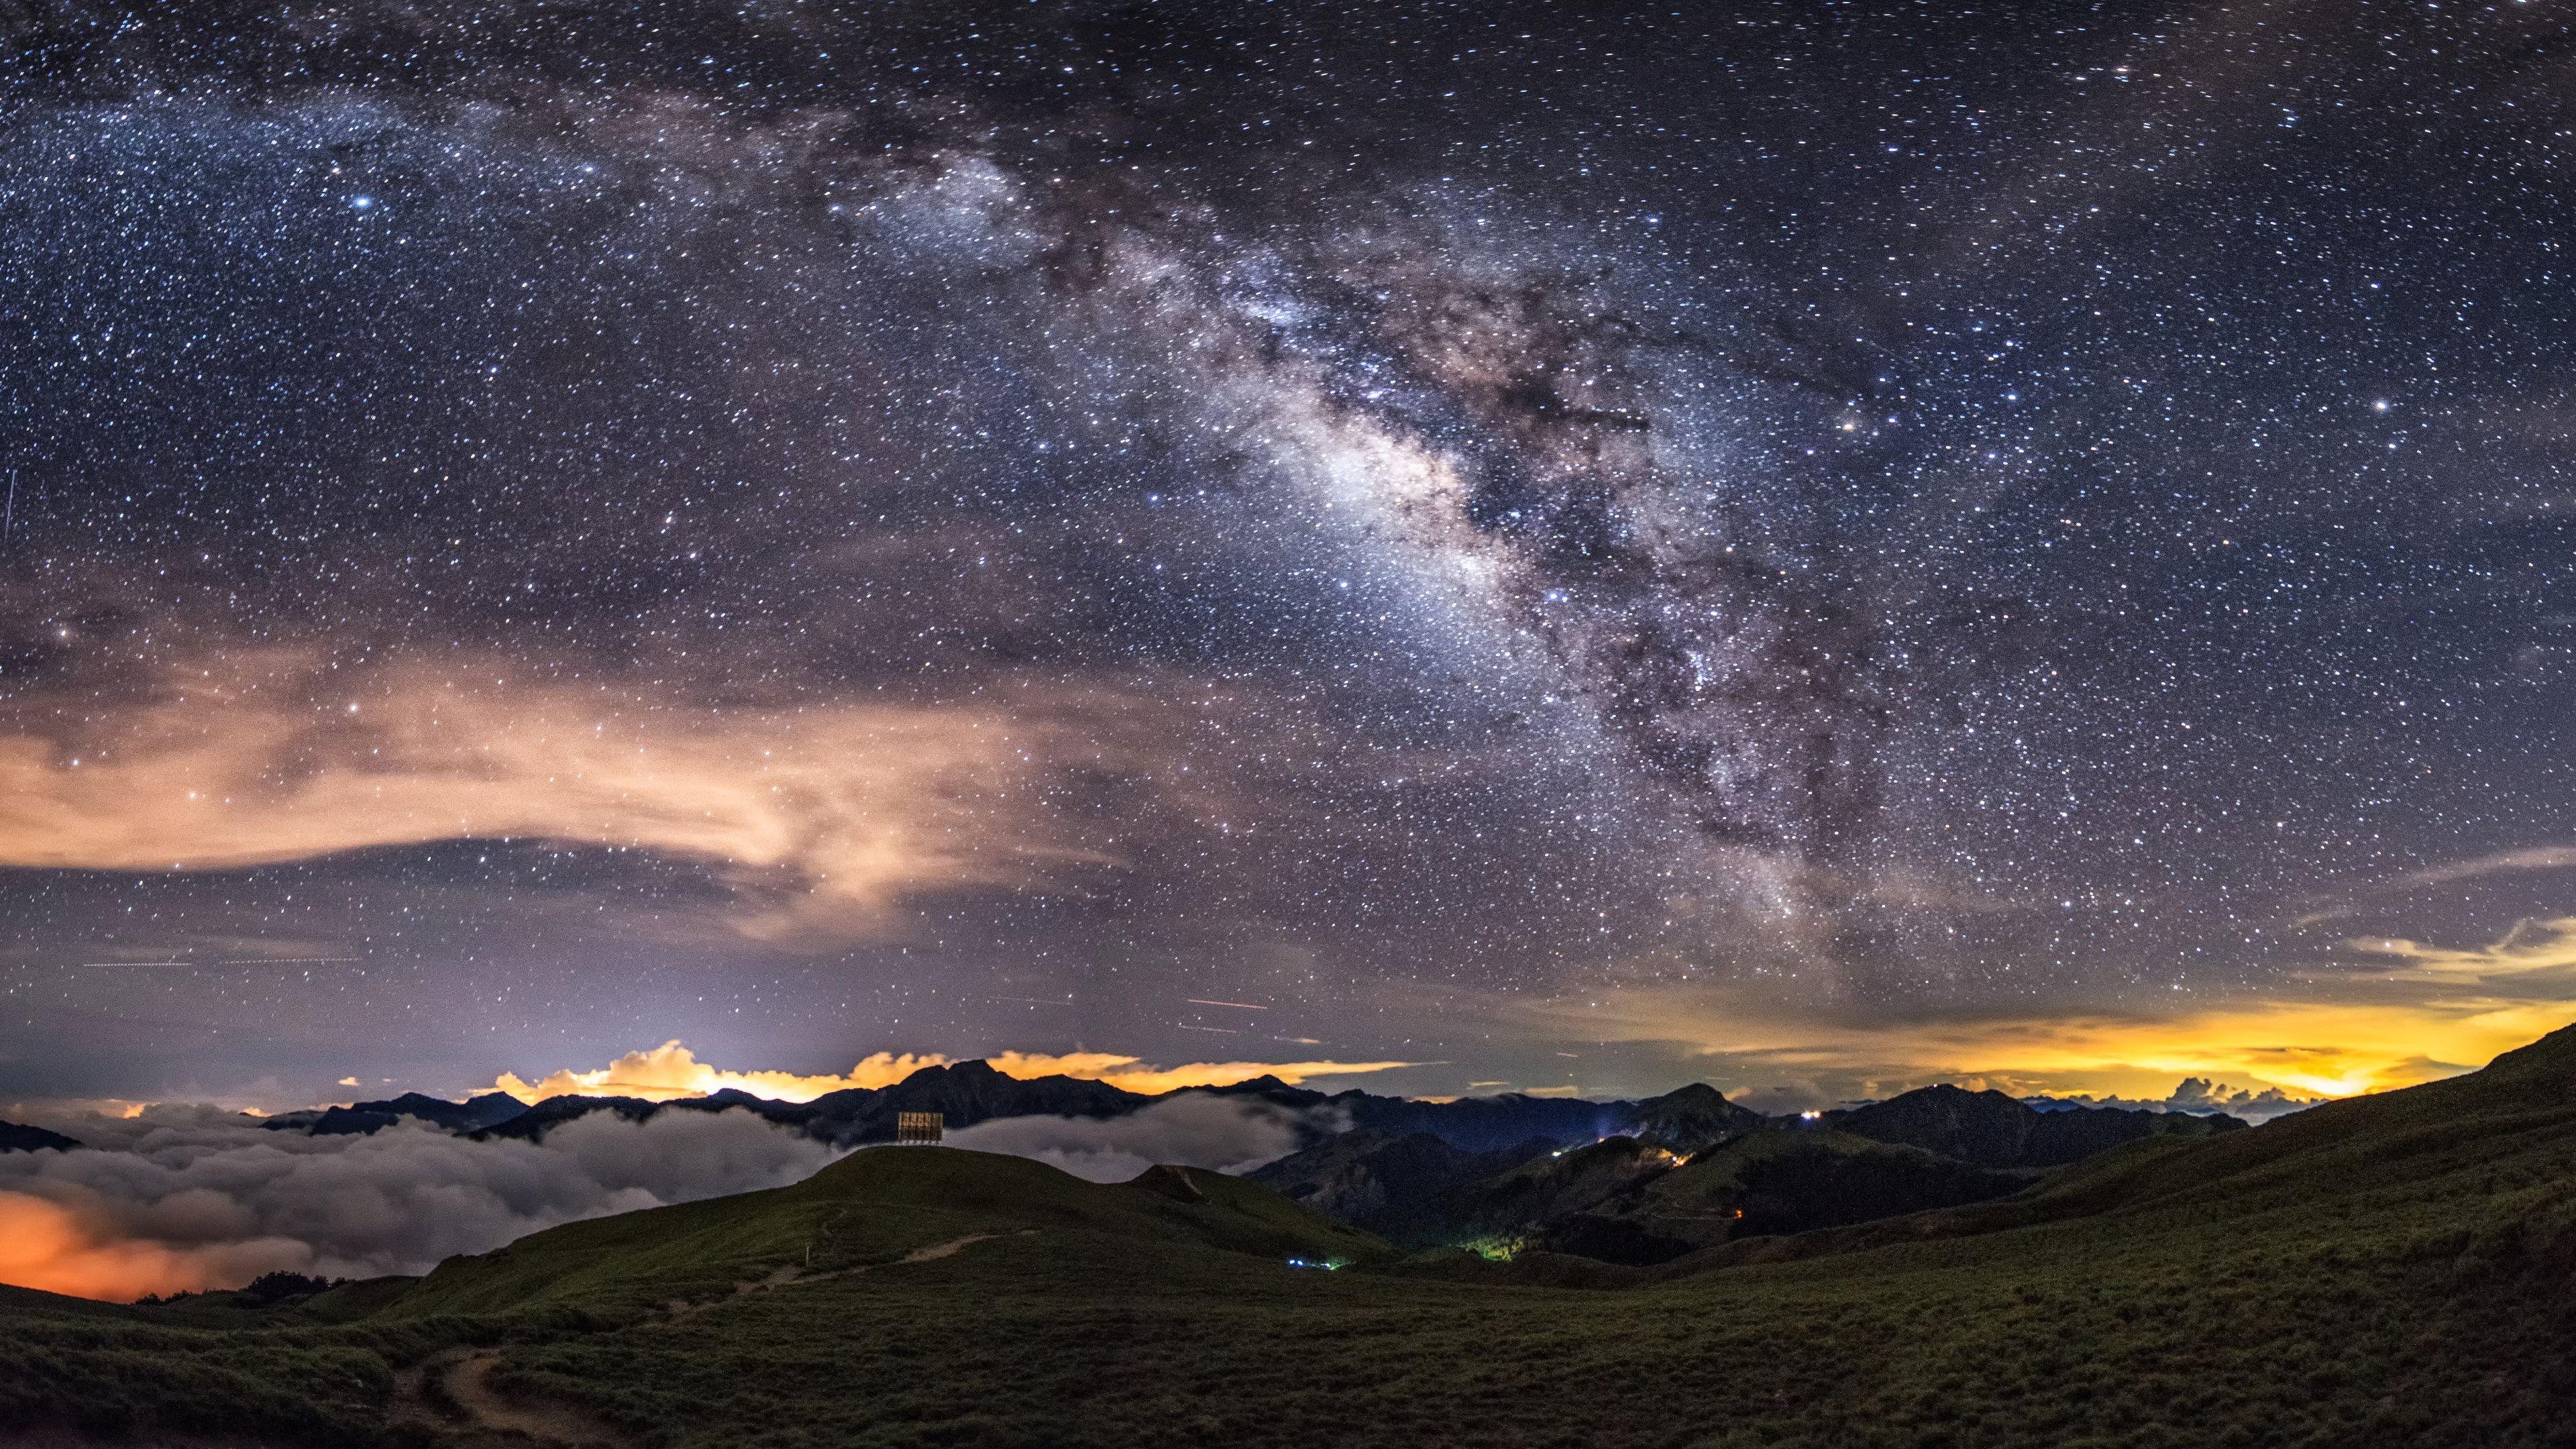 Great Milky Way Wallpaper Ultra HD High Resolution Wallpaper Full Size | Fotos